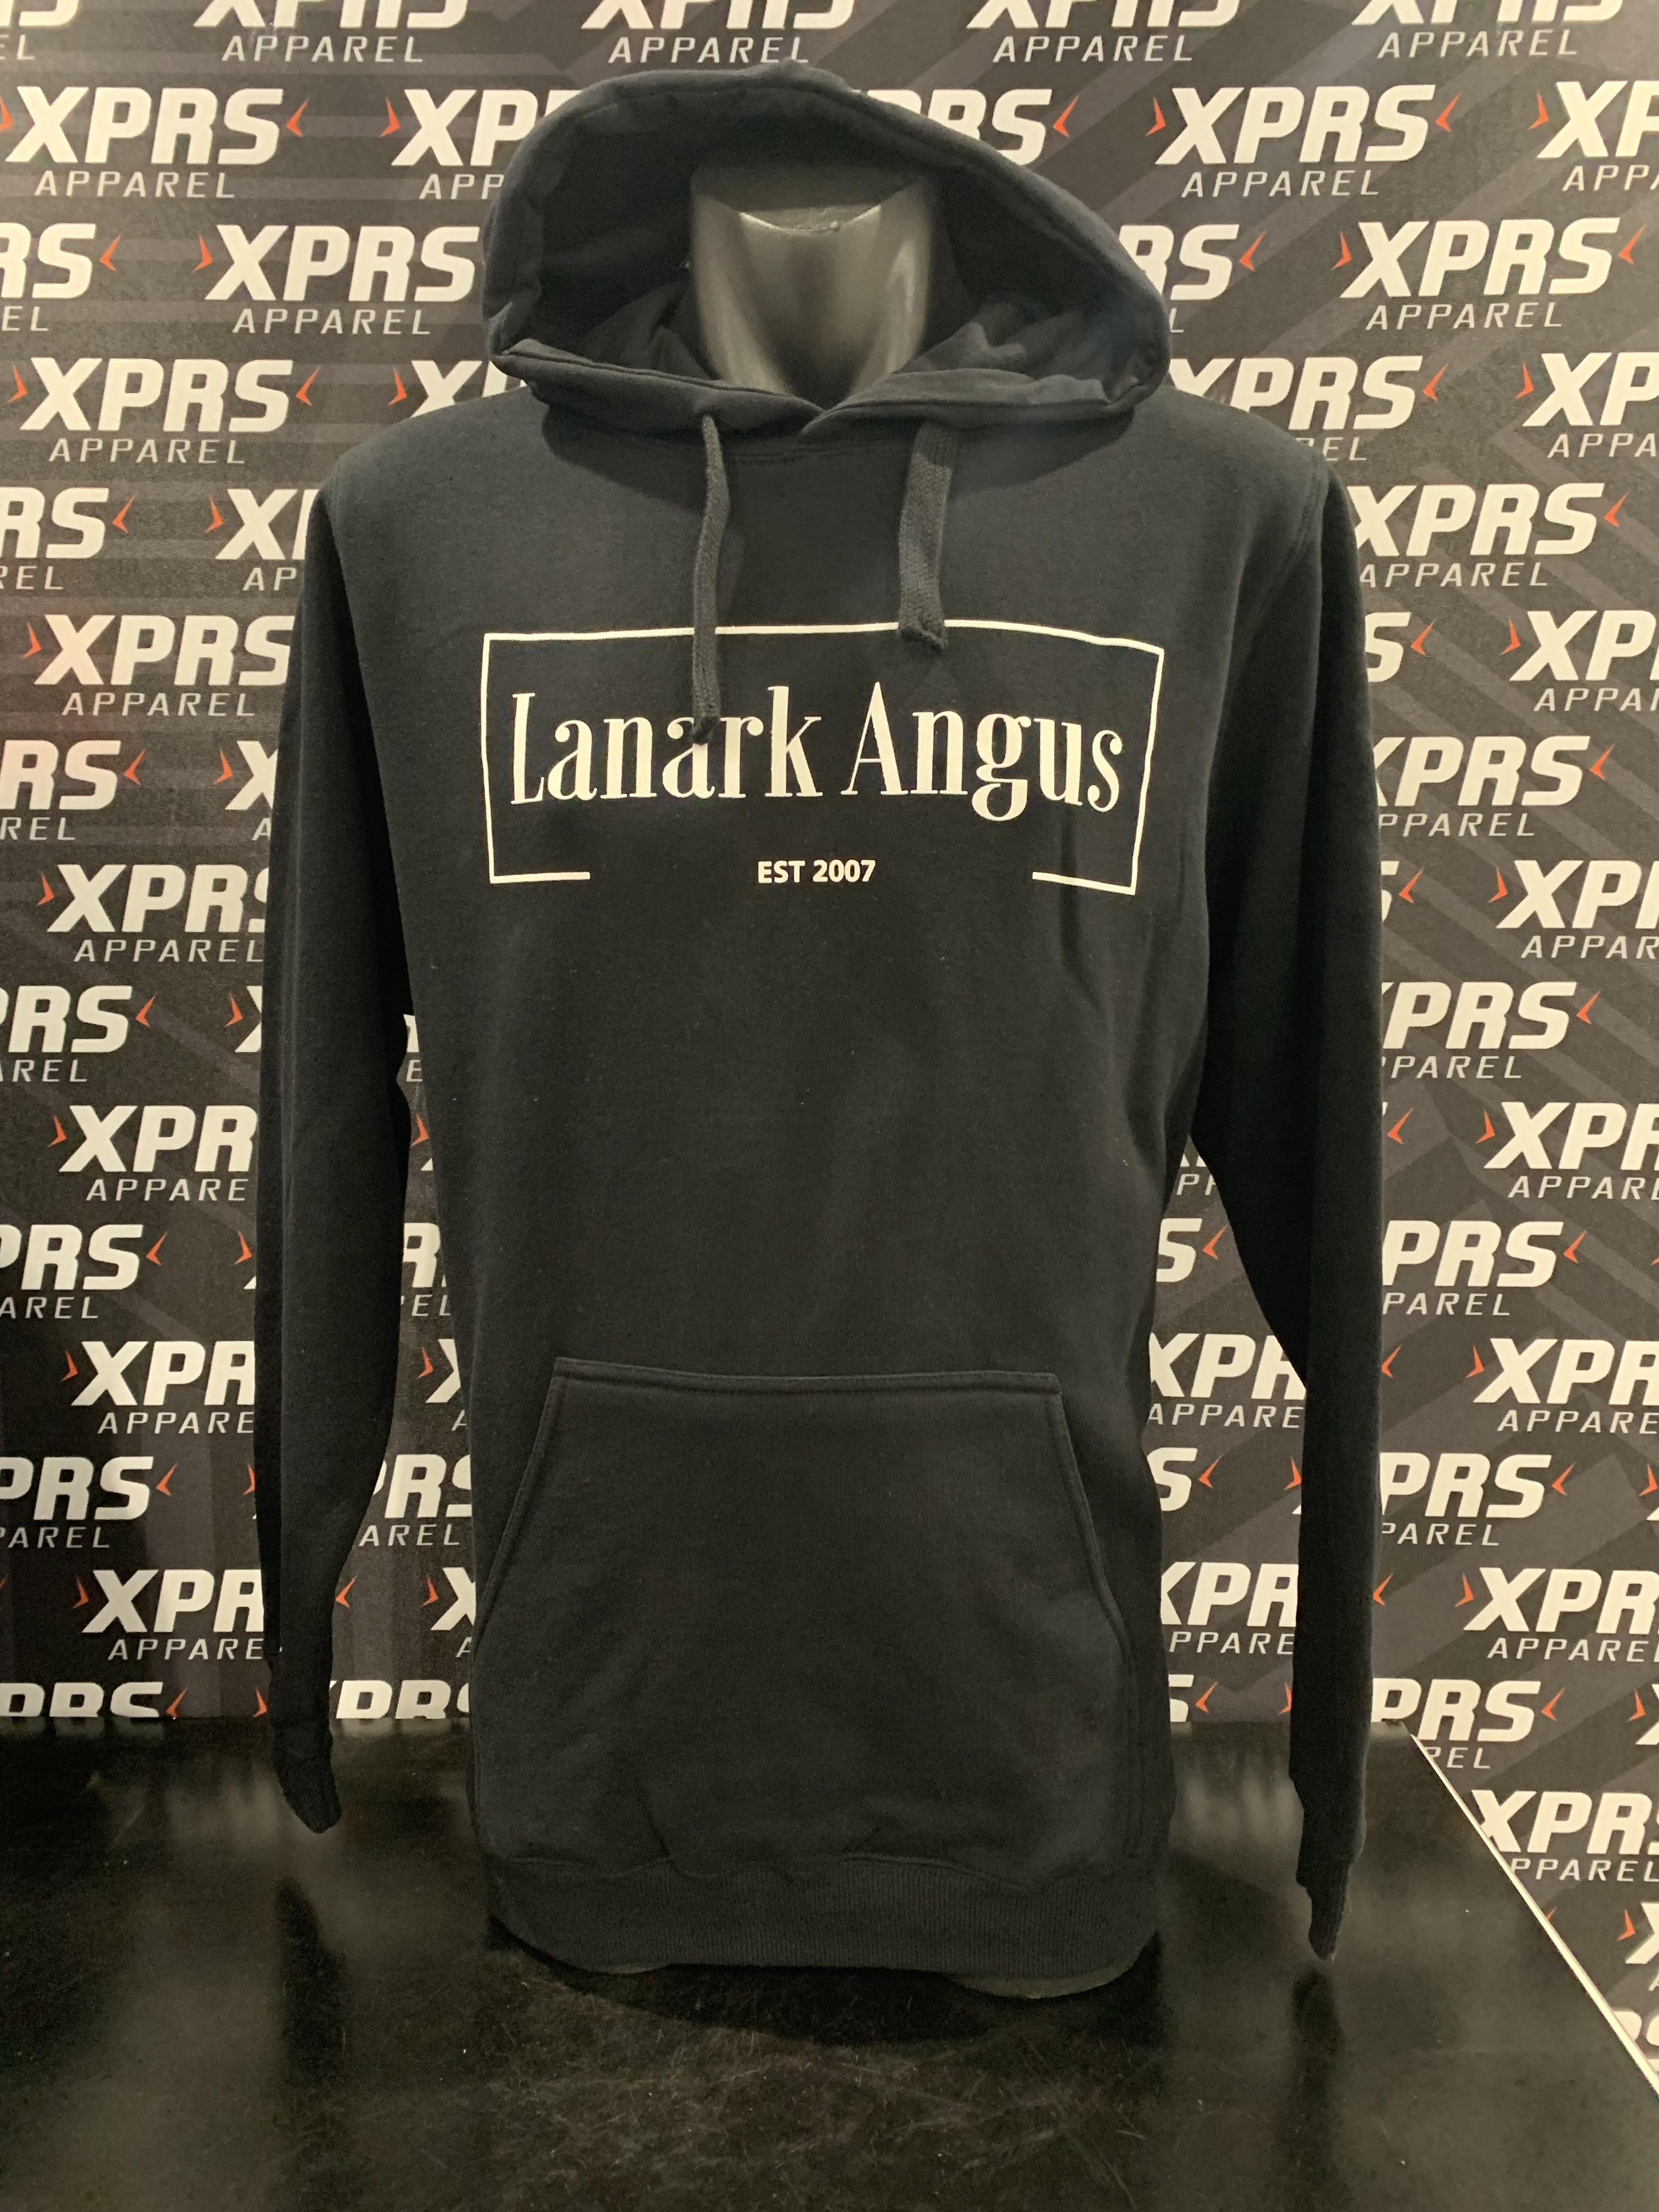 Lanark Angus Hoodies